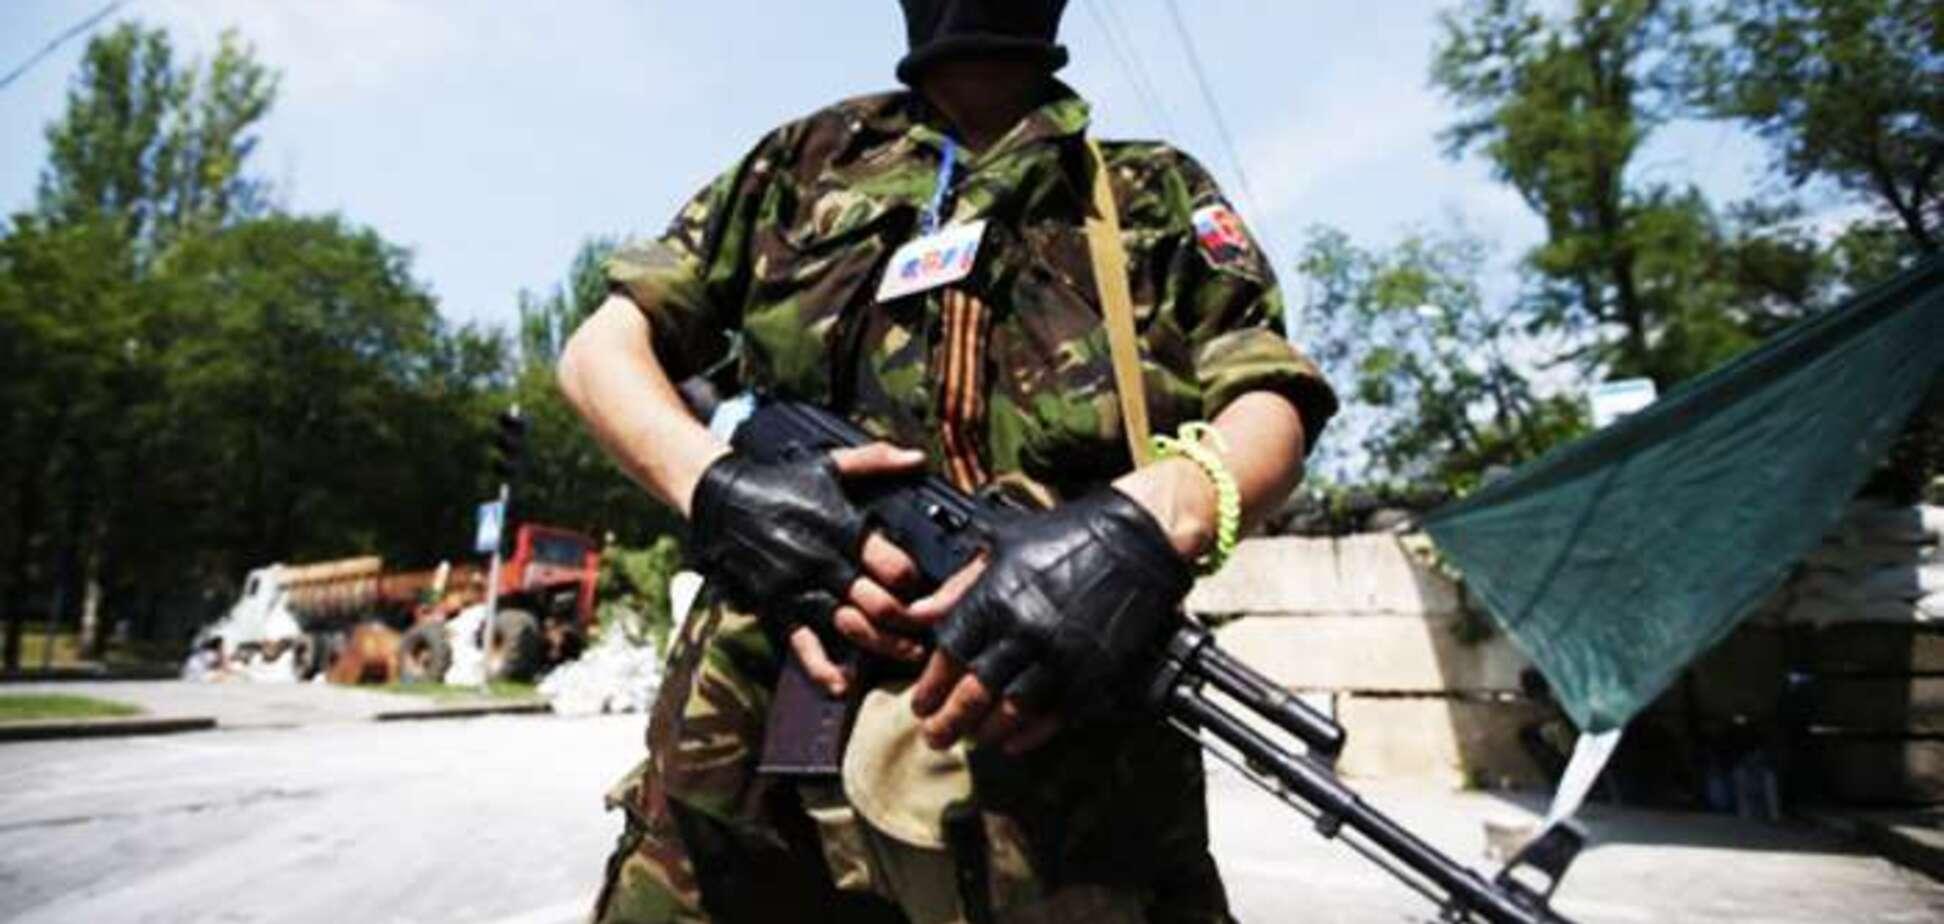 Под Донецком поймали террориста с арсеналом оружия: опубликованы фото